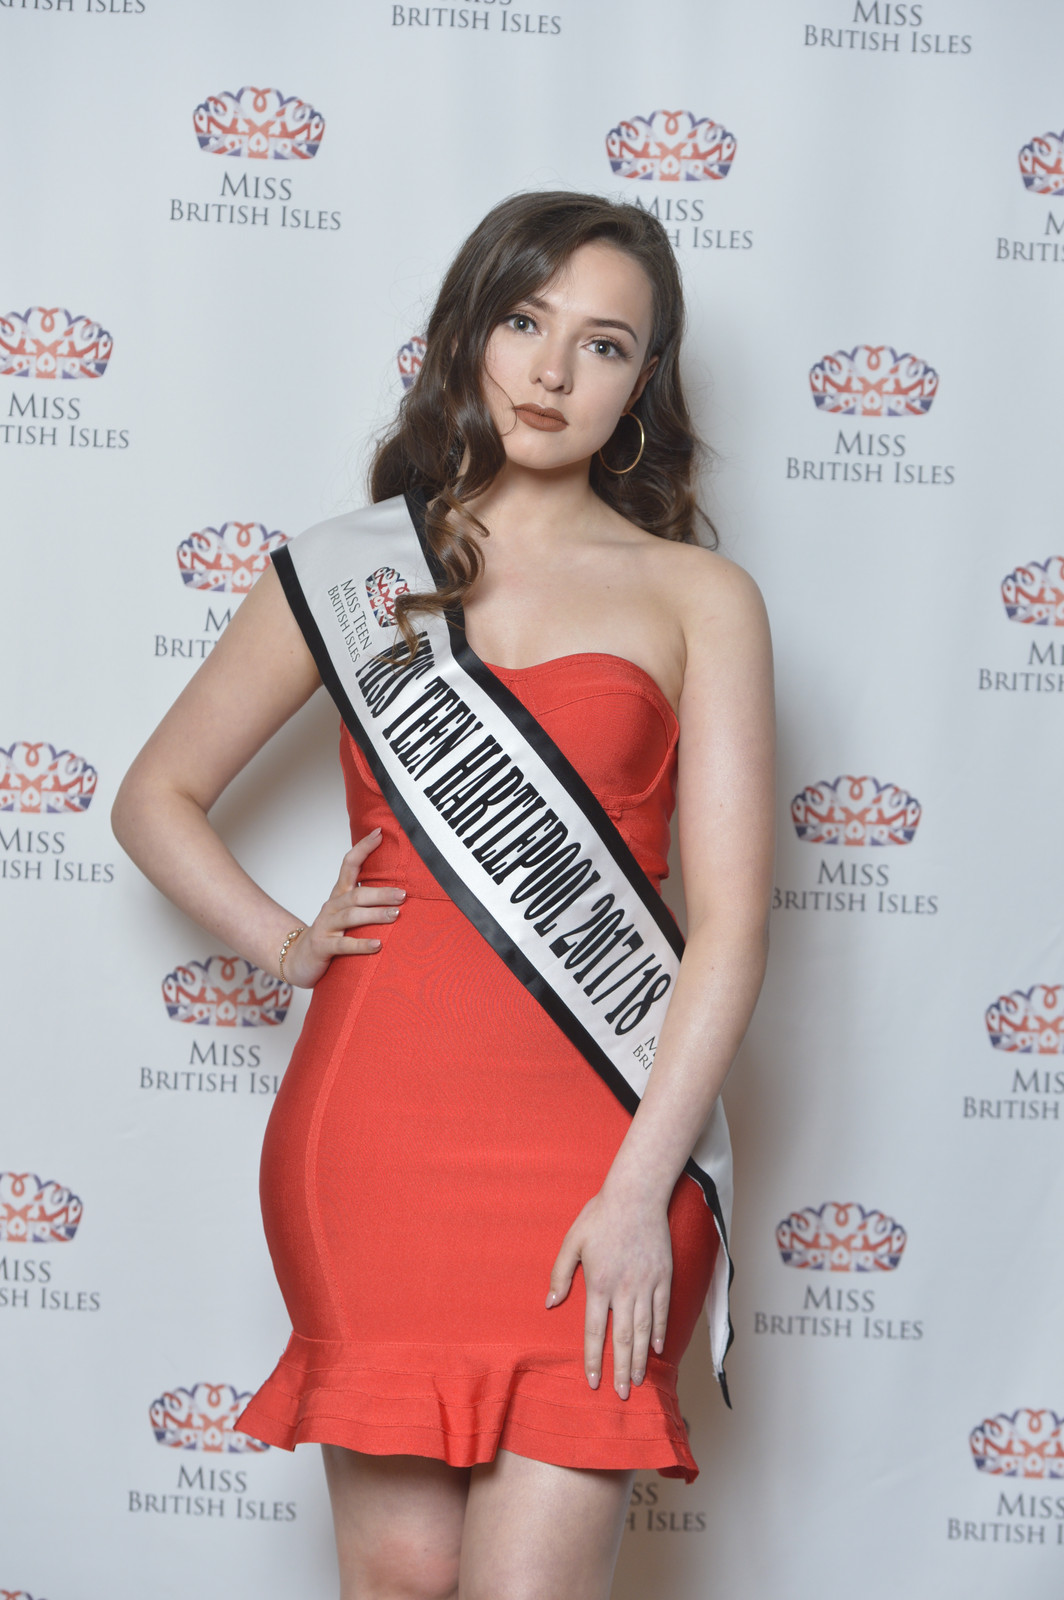 Miss Teen British Isles 2018